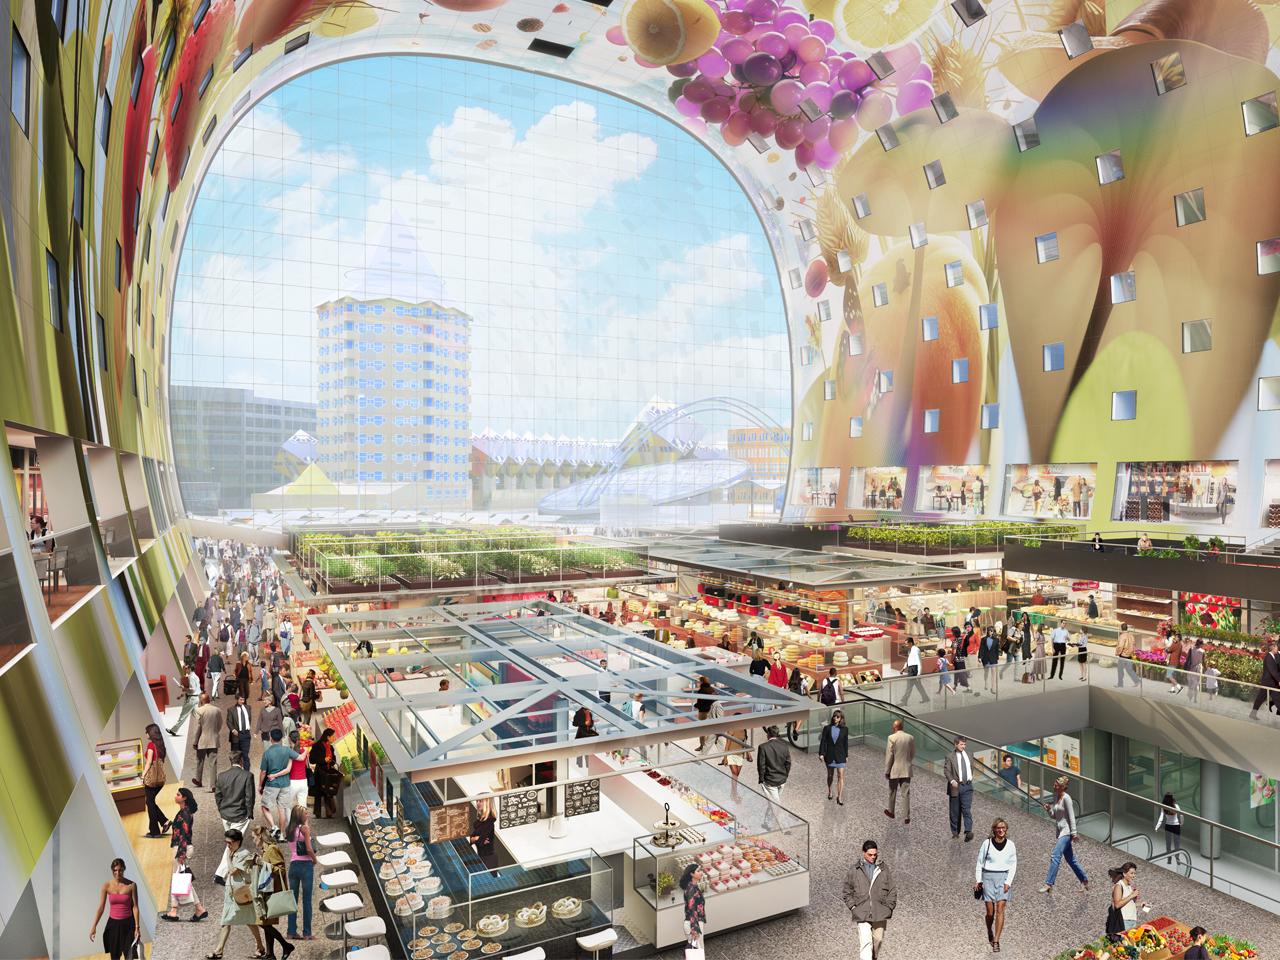 MVRDV - CNN lists Market Hall among the world top 10 architectural ...